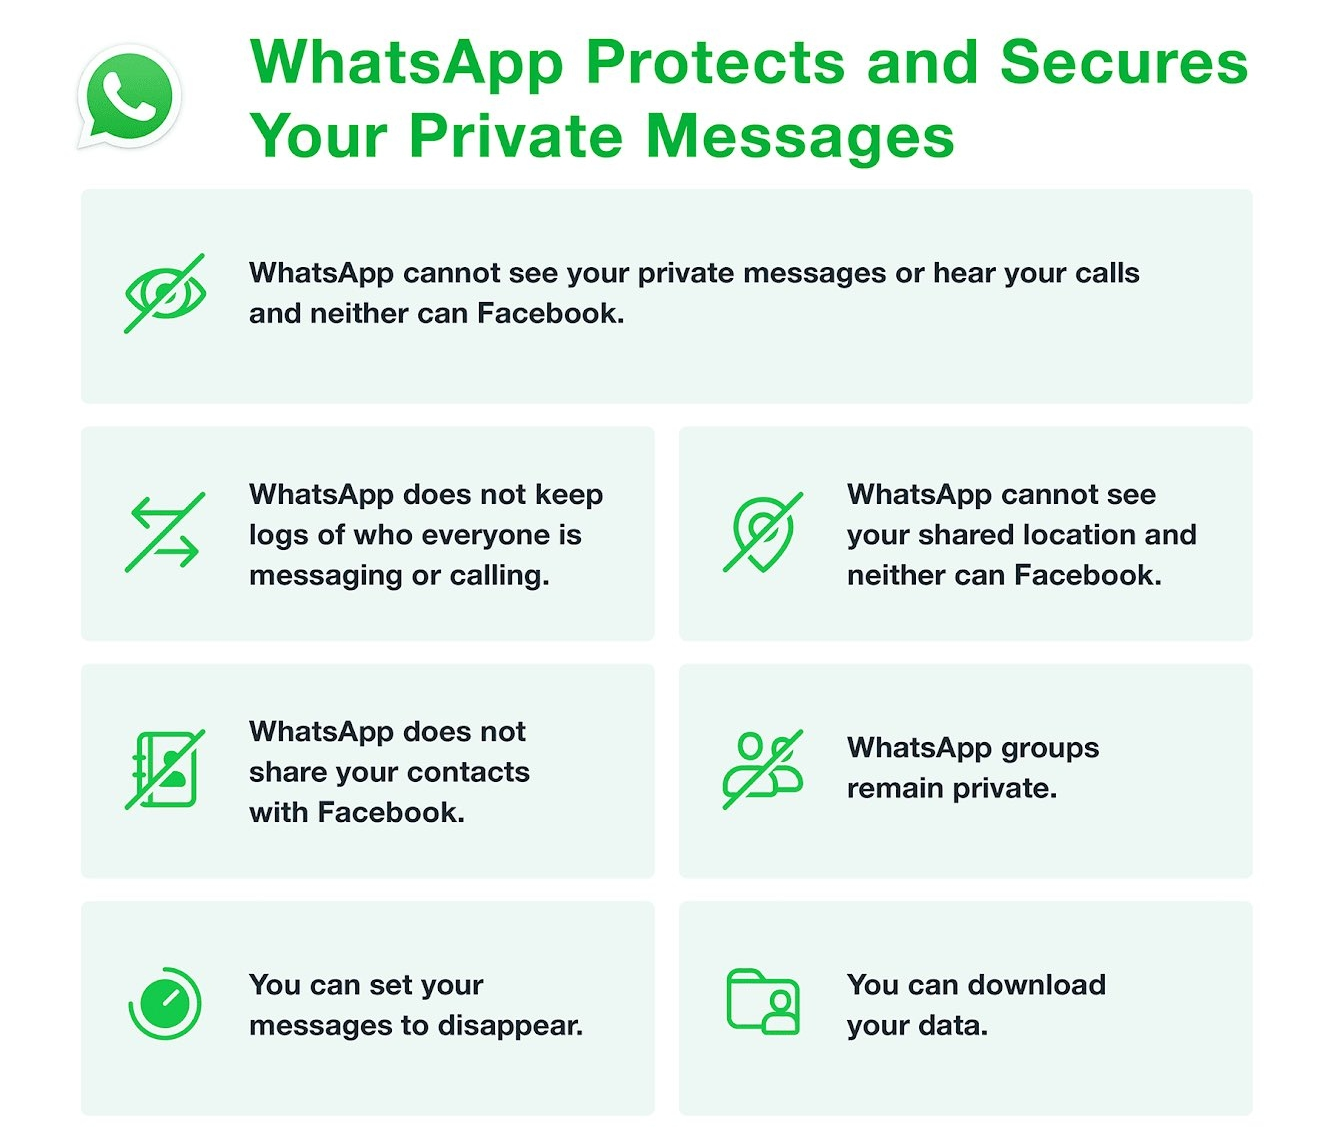 WhatsApp Advantages